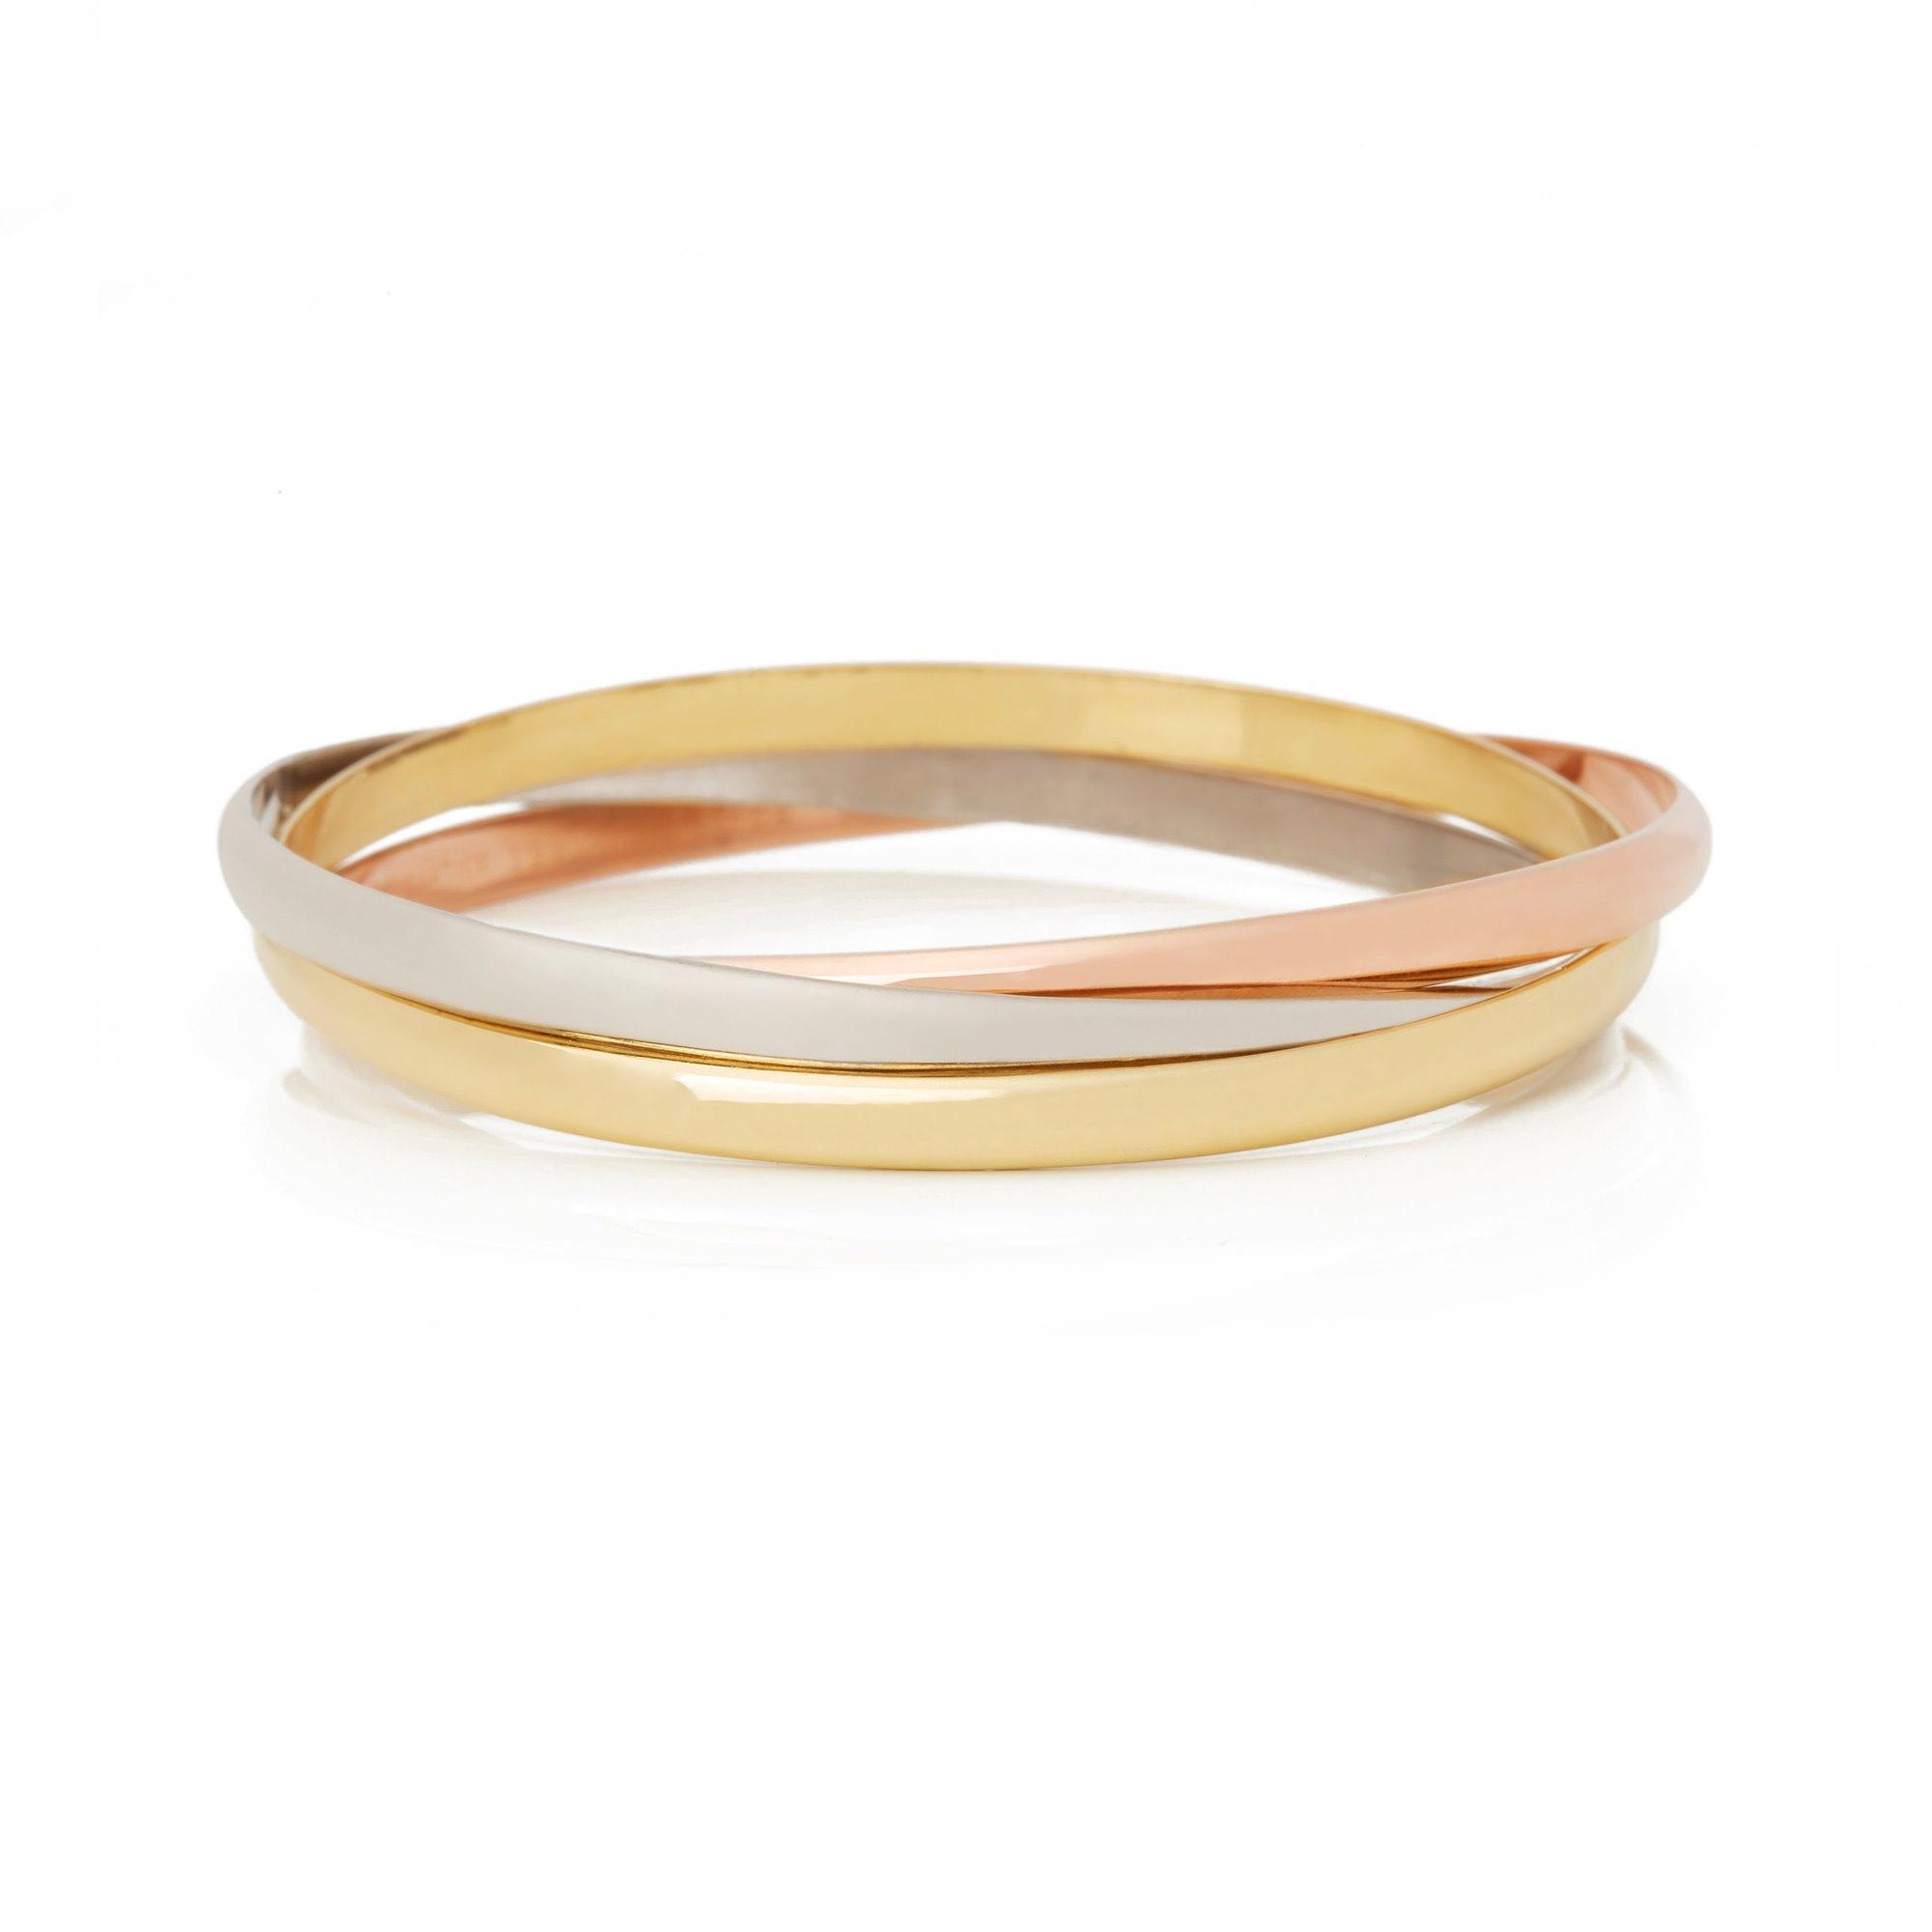 Cartier 18k Yellow, White & Rose Gold Medium Trinity Bracelet